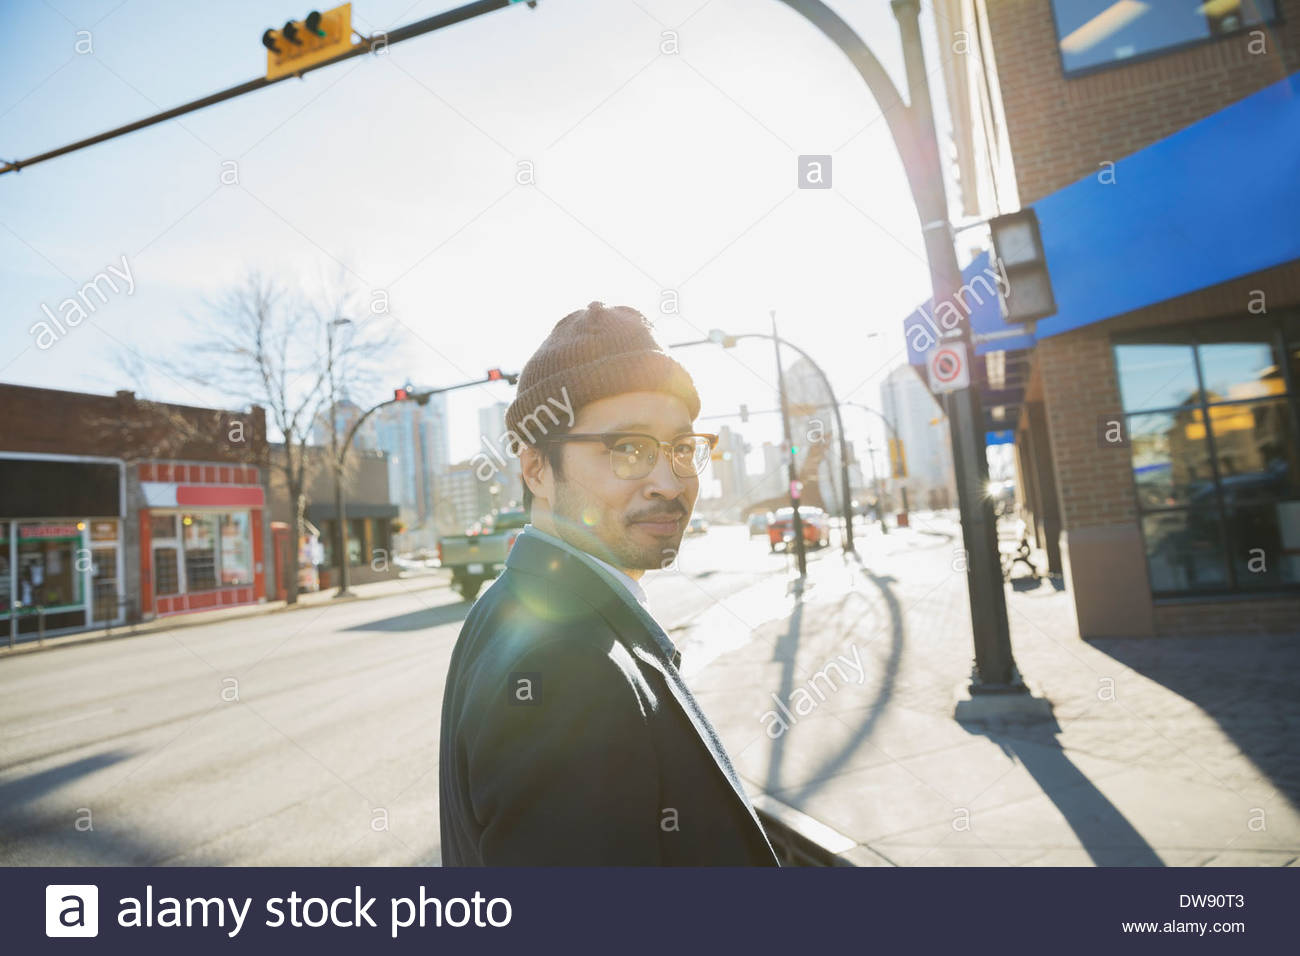 Side view portrait of man walking on city street - Stock Image